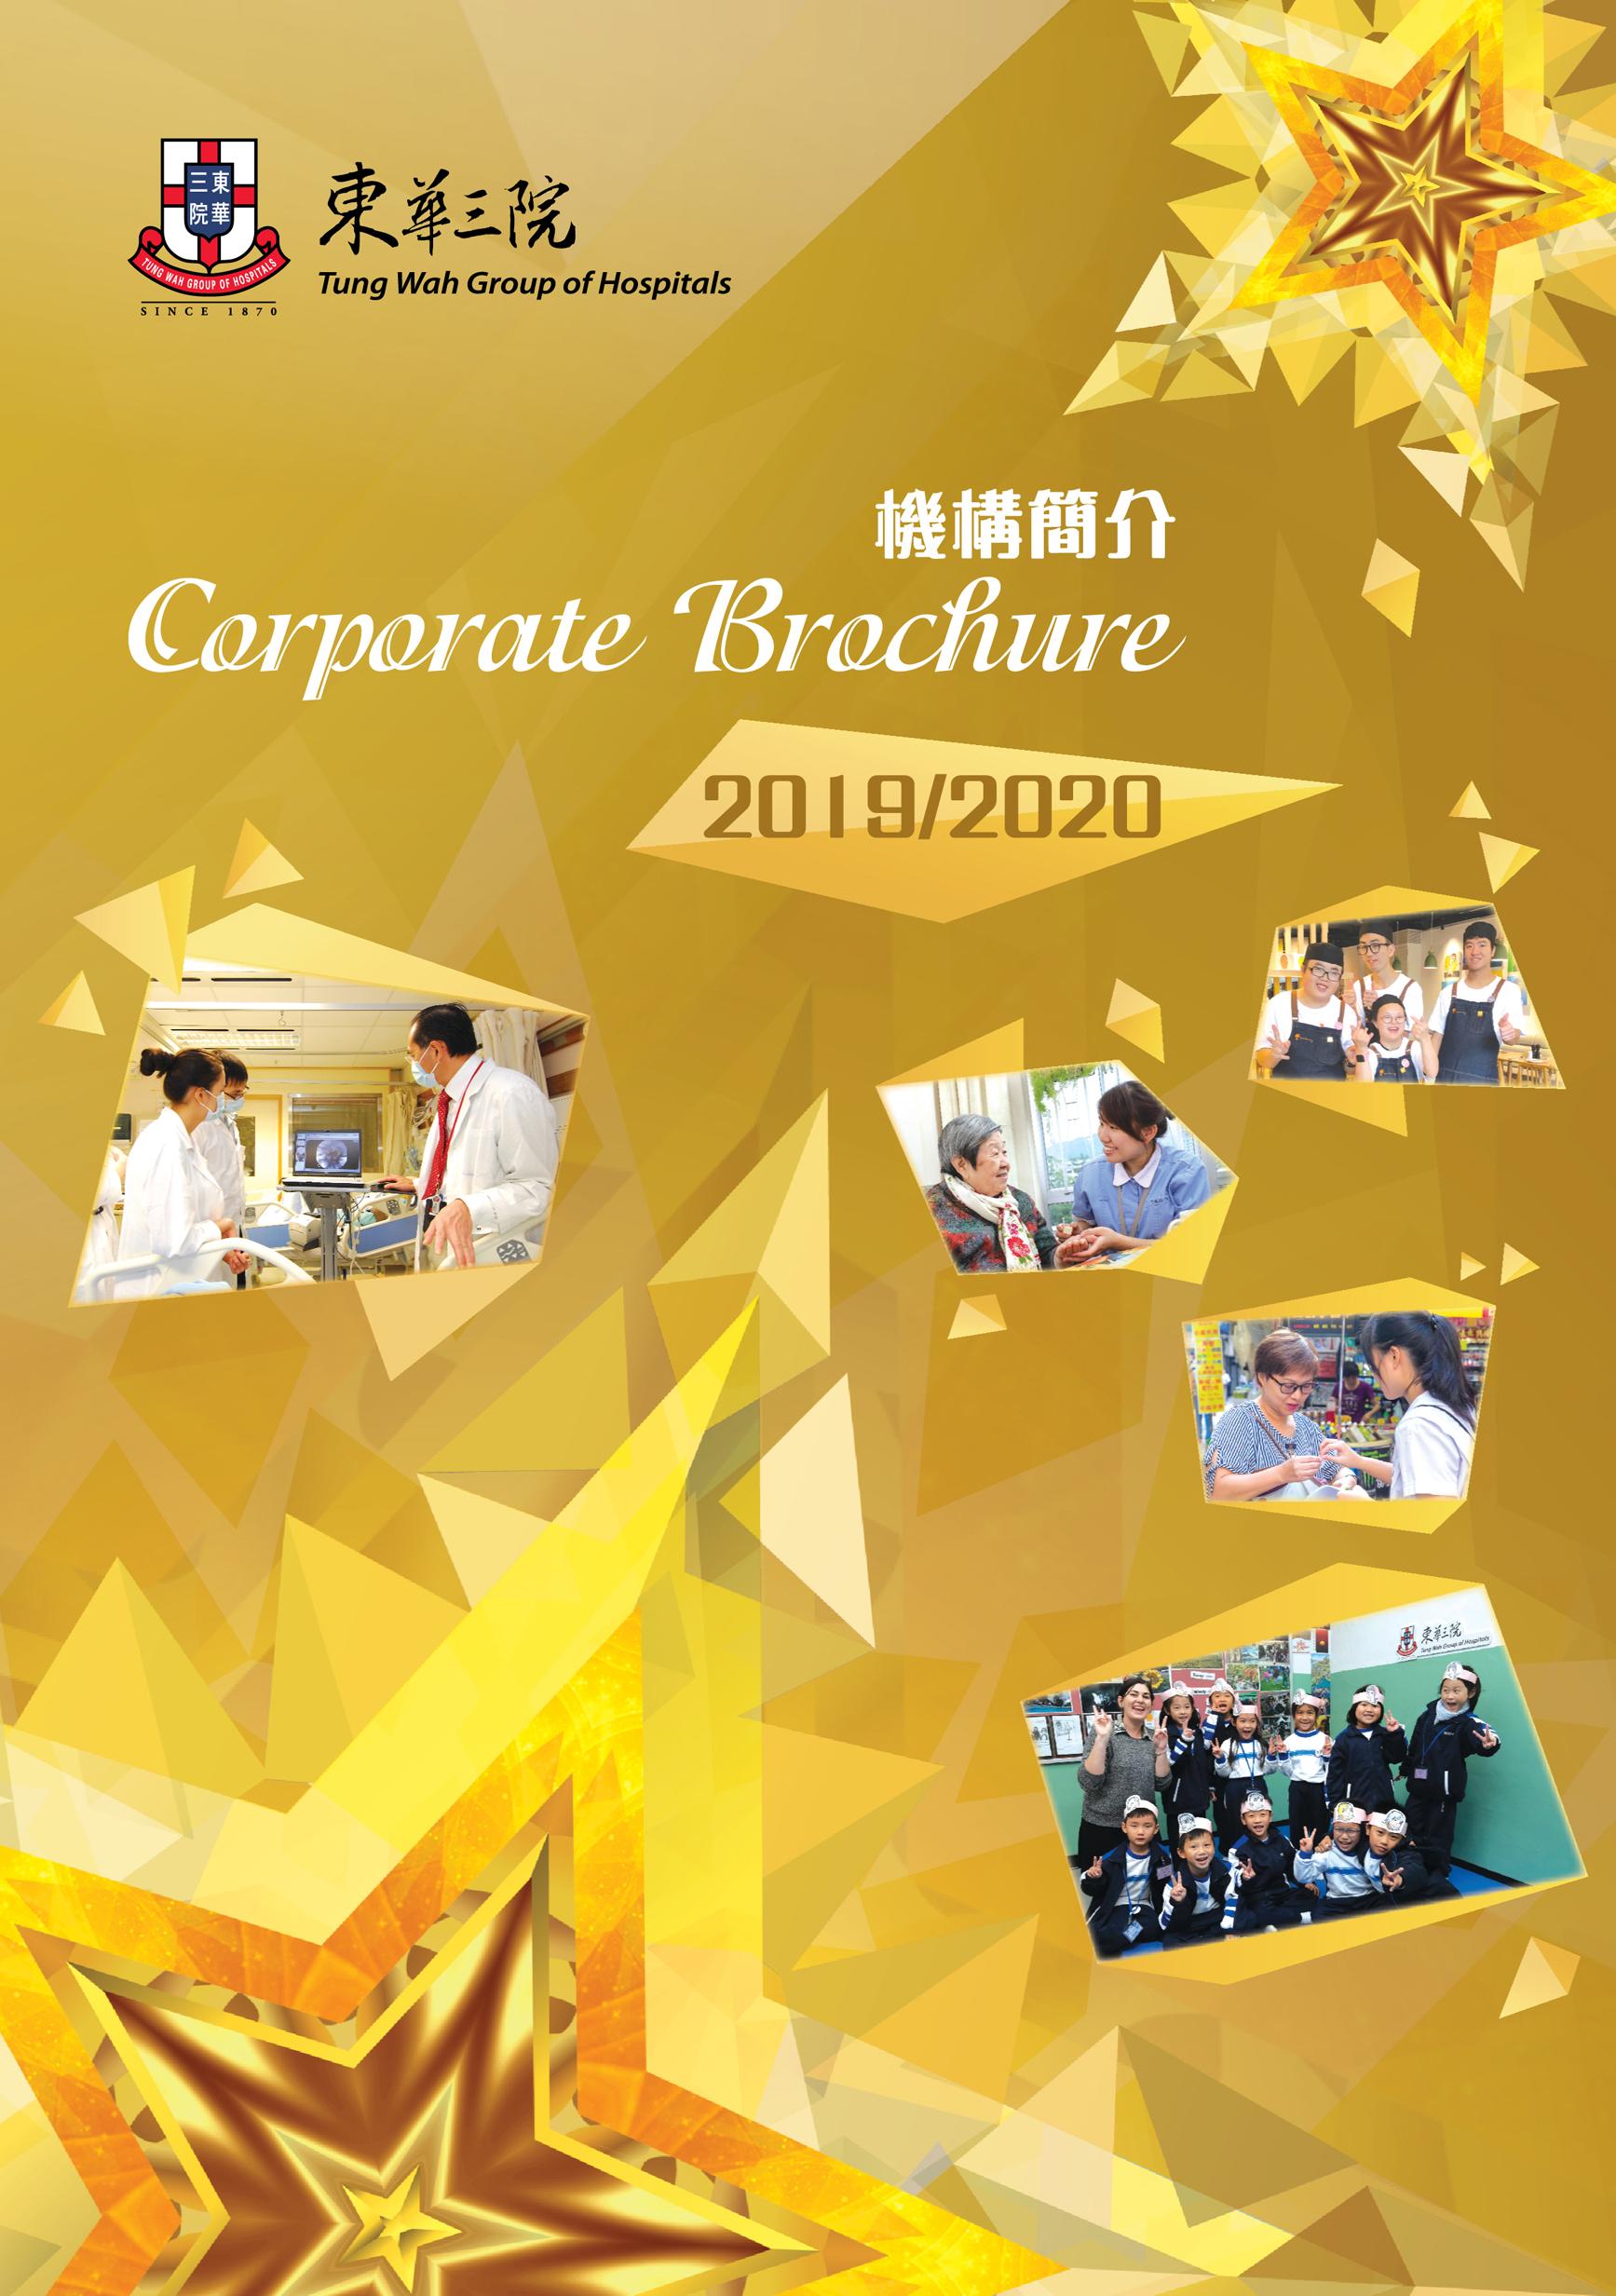 X0404-TWGHs Corporate Brochure_B2_0528